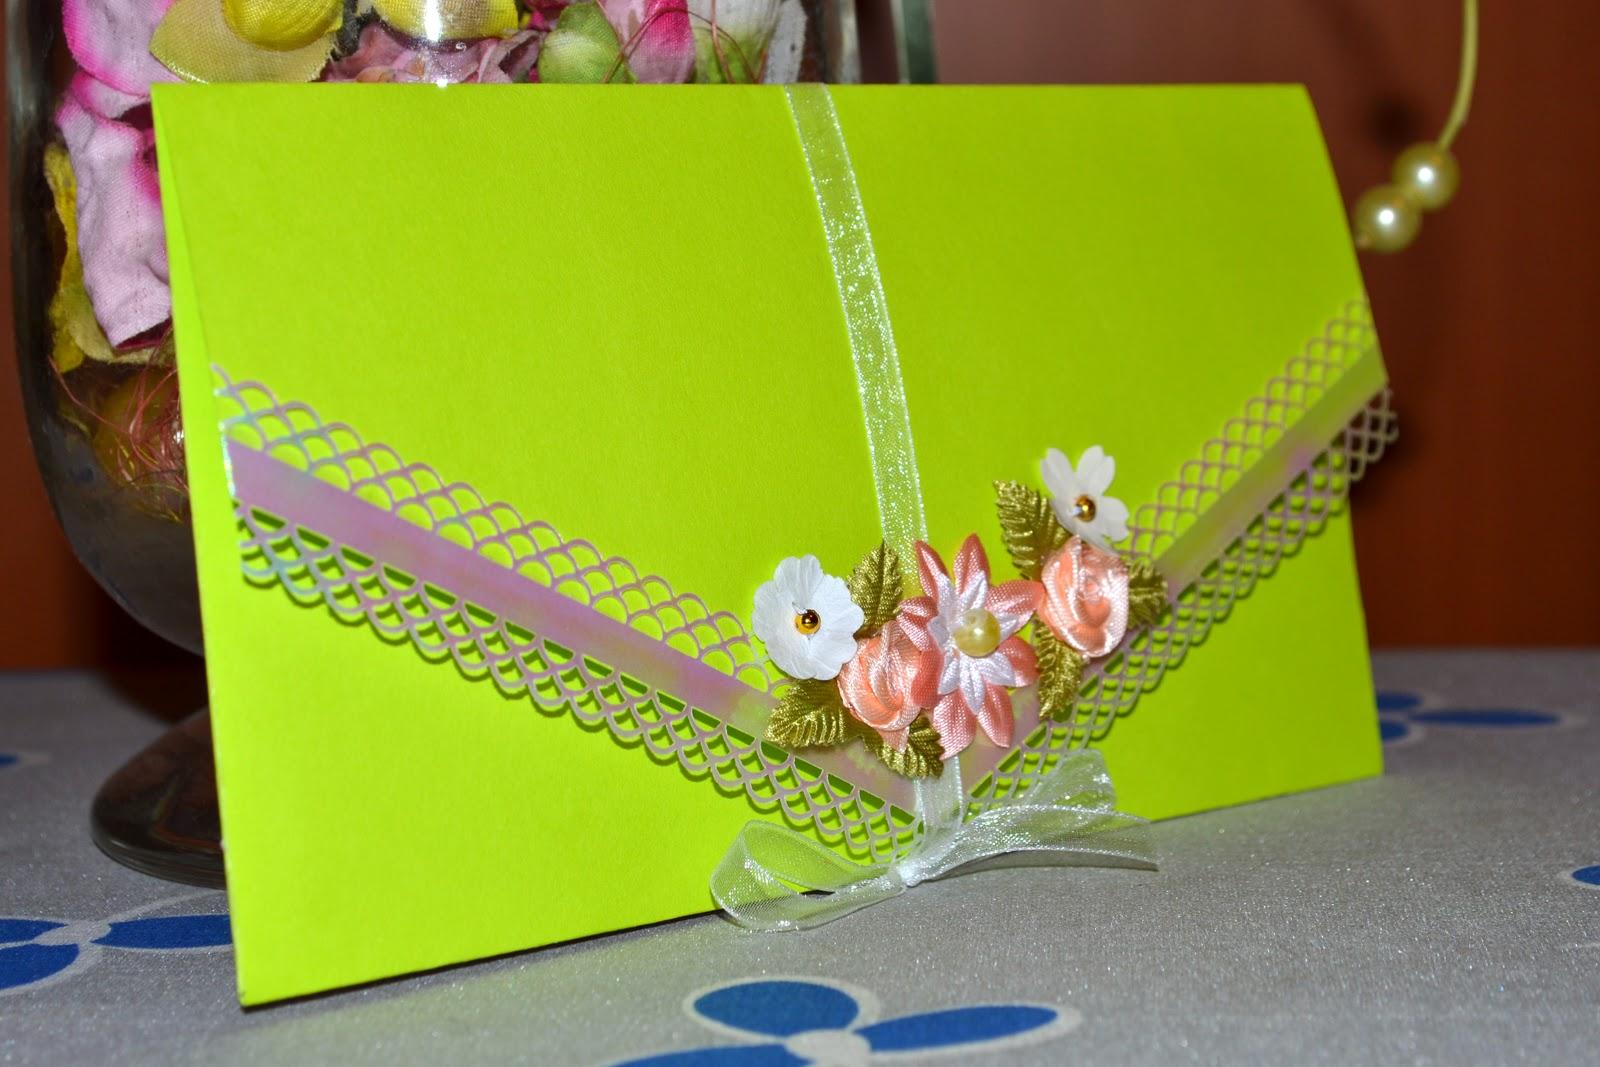 Подарунок своми руками на день народження з паперу - Моя книга 11